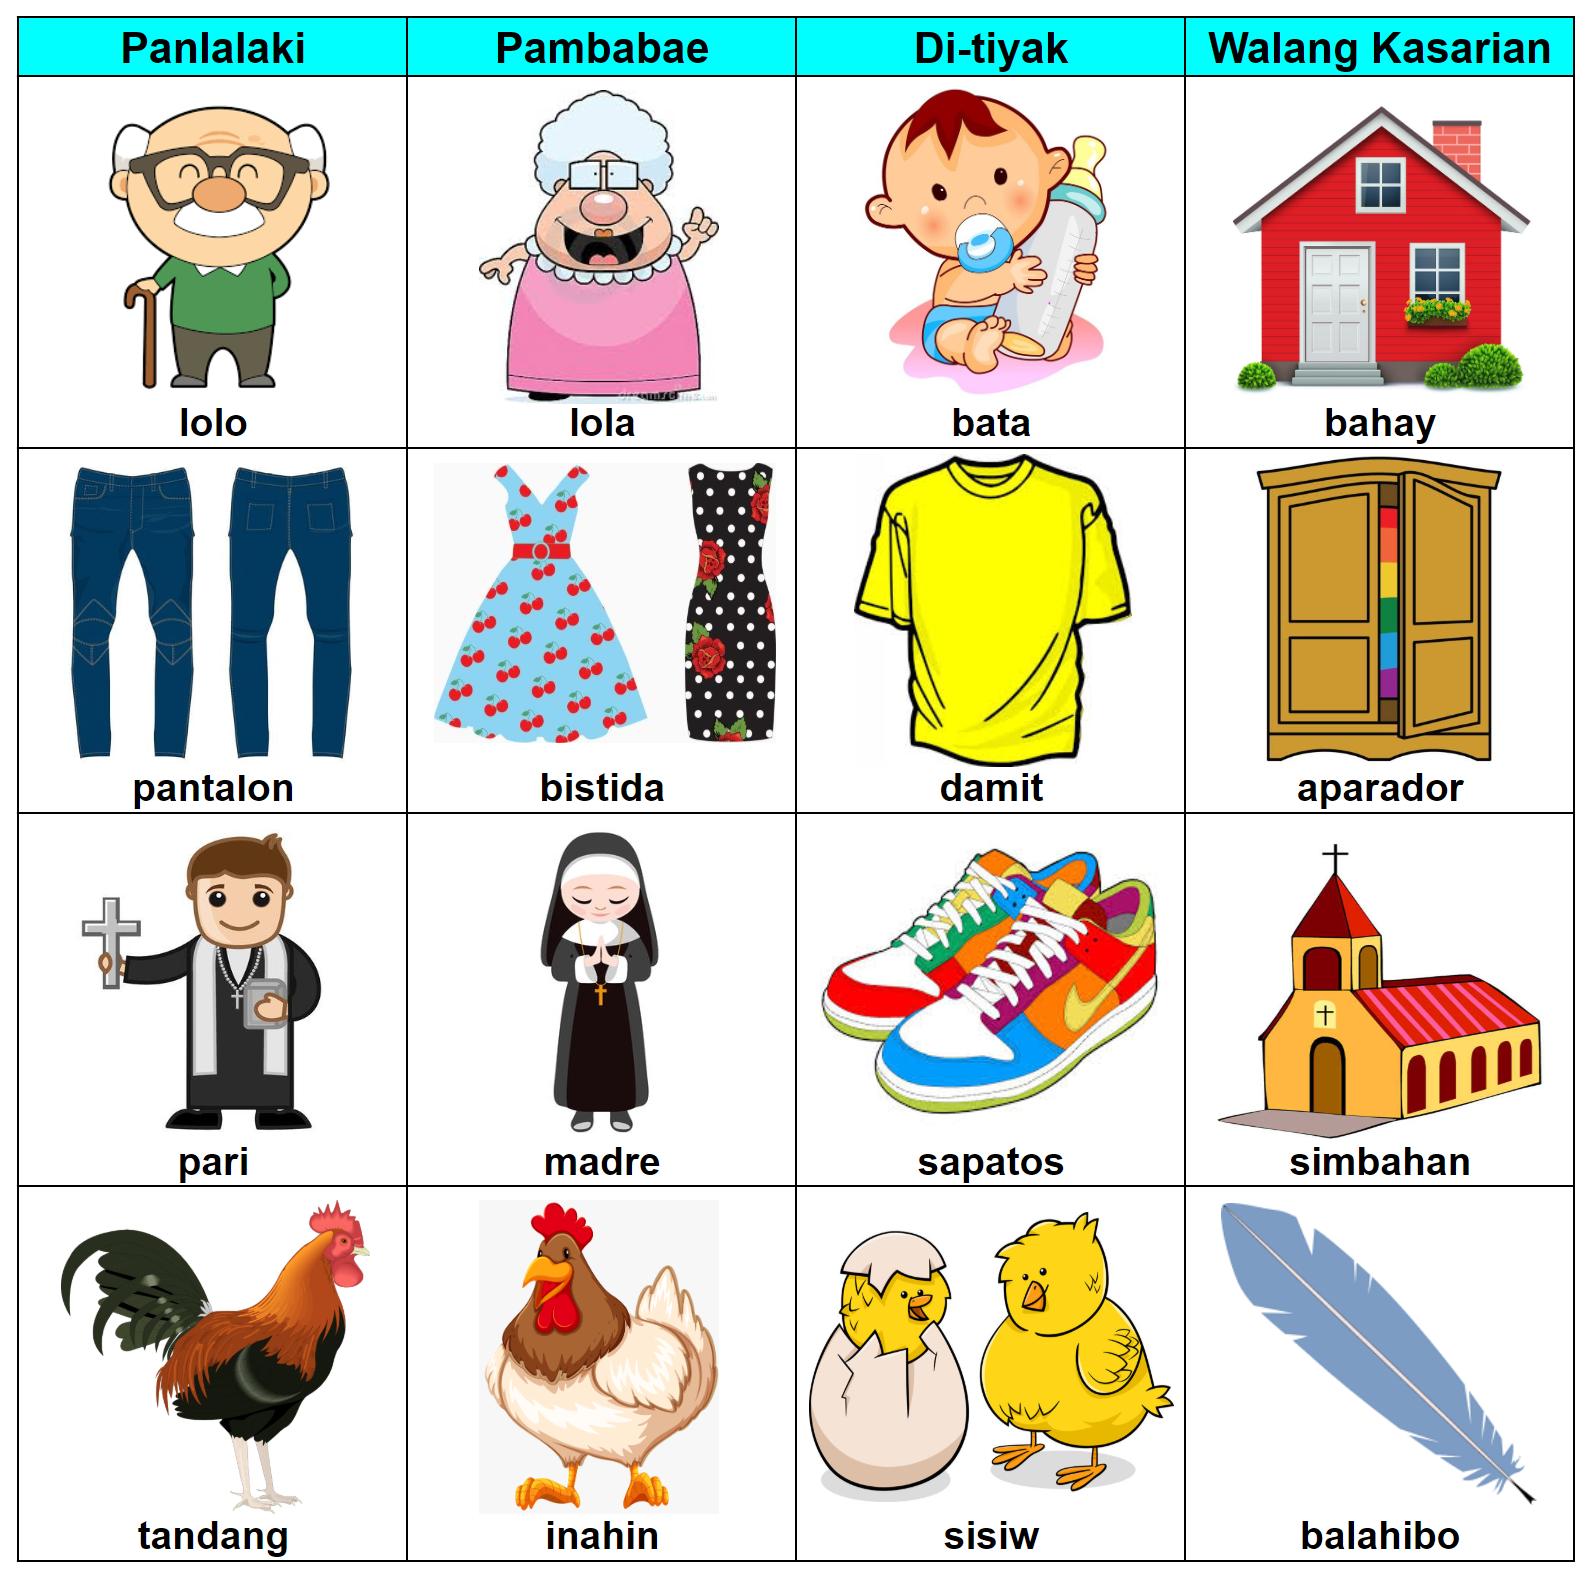 Pangngalan Noun School Activities School Projects Remedial Reading [ 1580 x 1594 Pixel ]